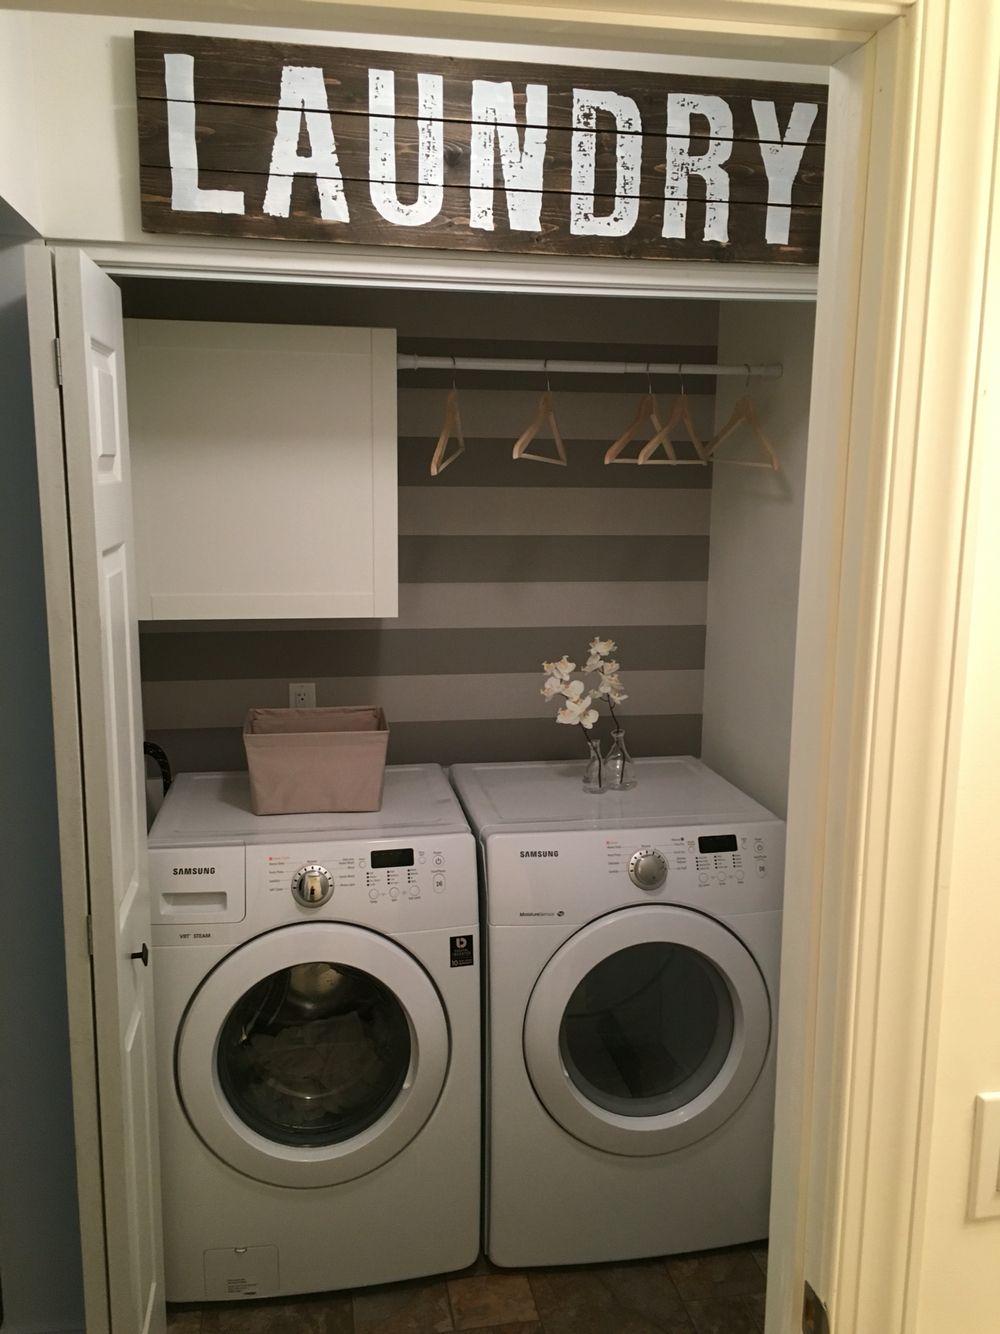 laundry room closet organization | My new laundry closet in 2019 | Laundry closet makeover ...